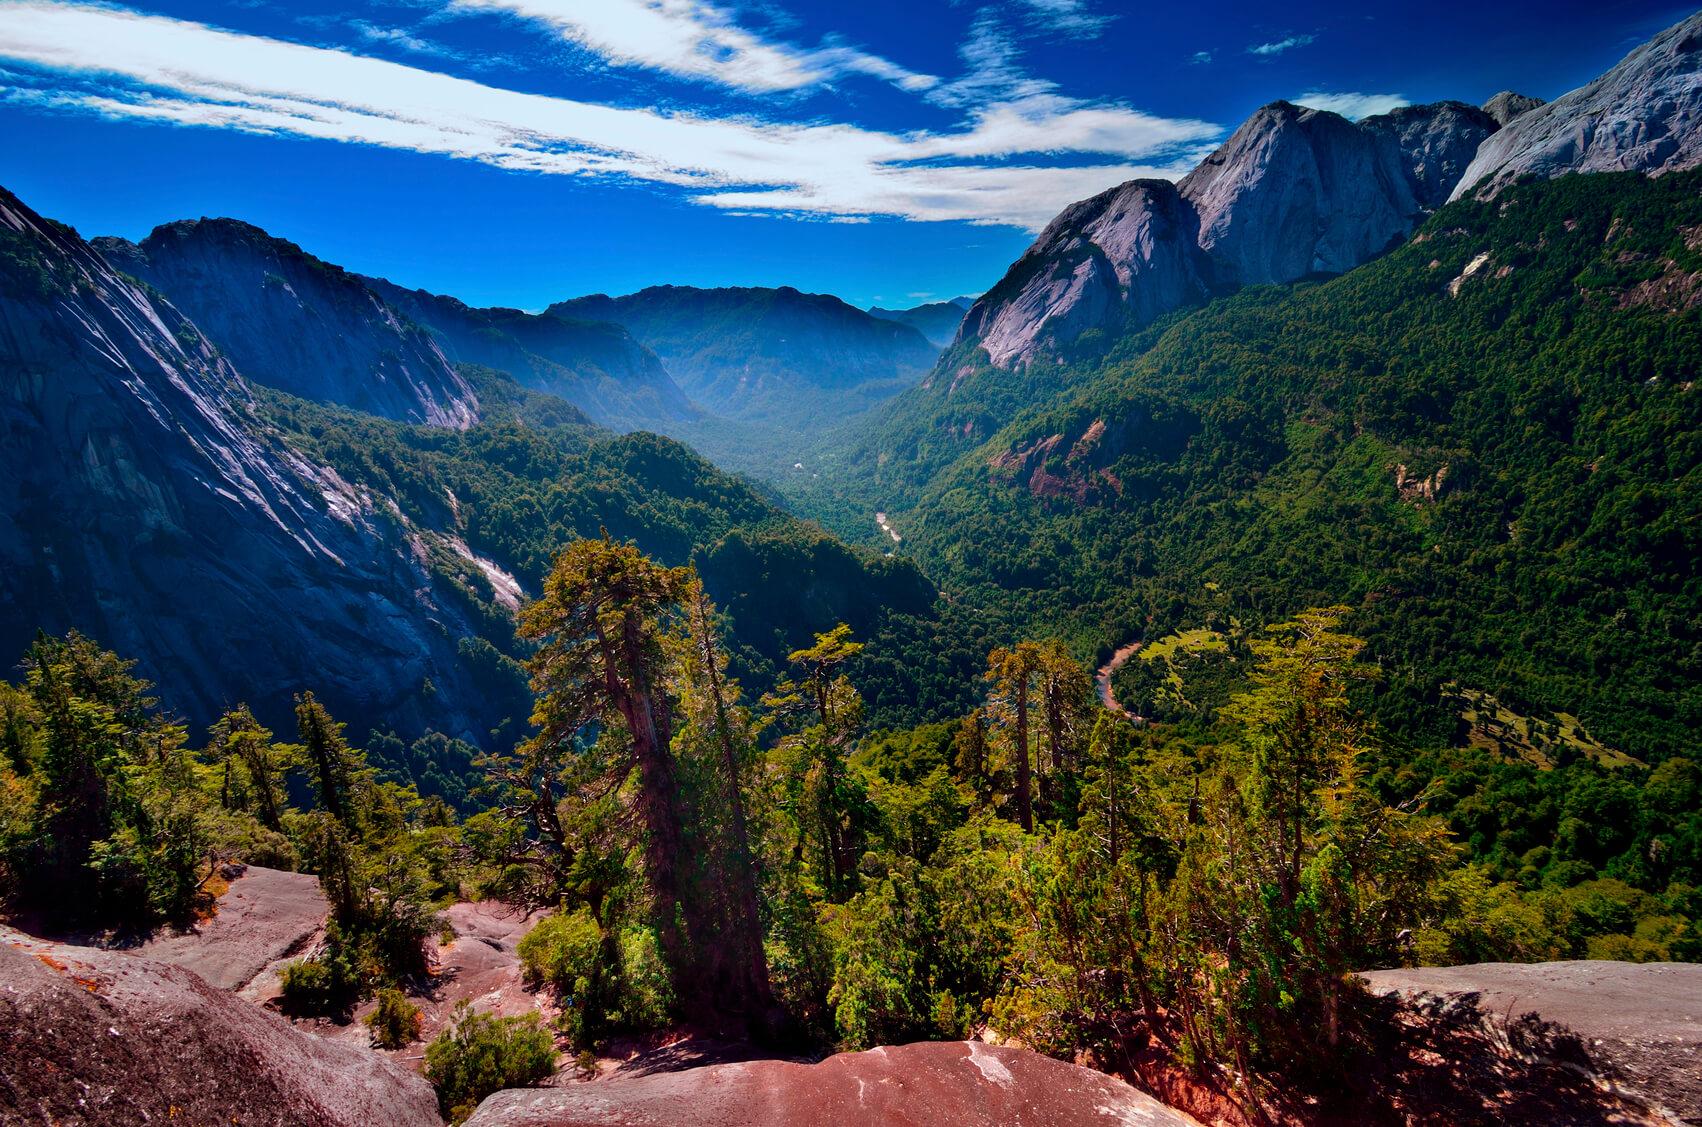 15 lugares de Chile para visitar este fin de semana largo